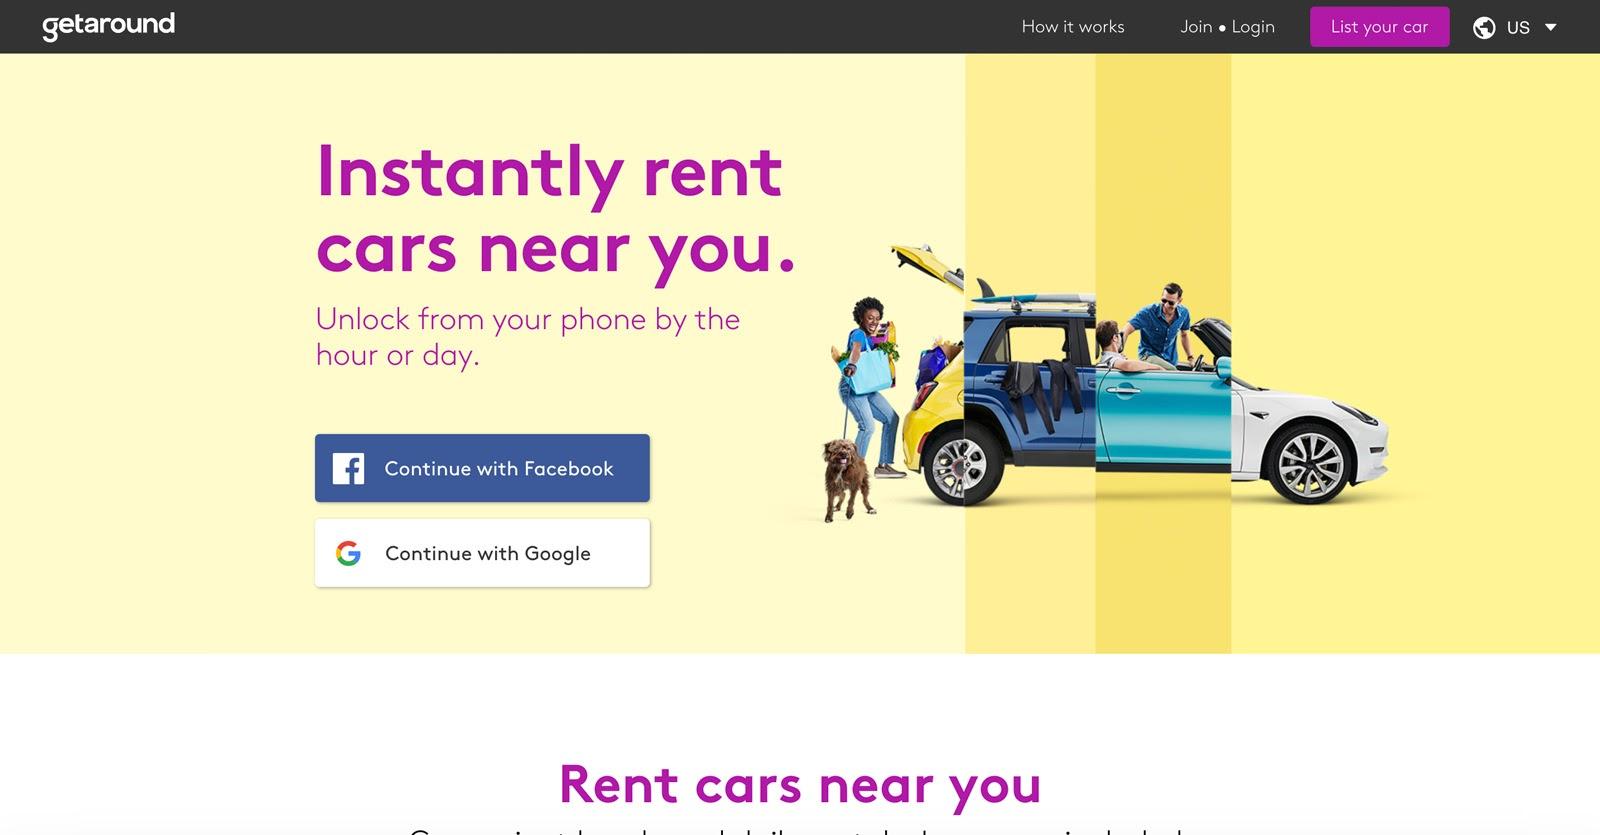 rent cars with getaround